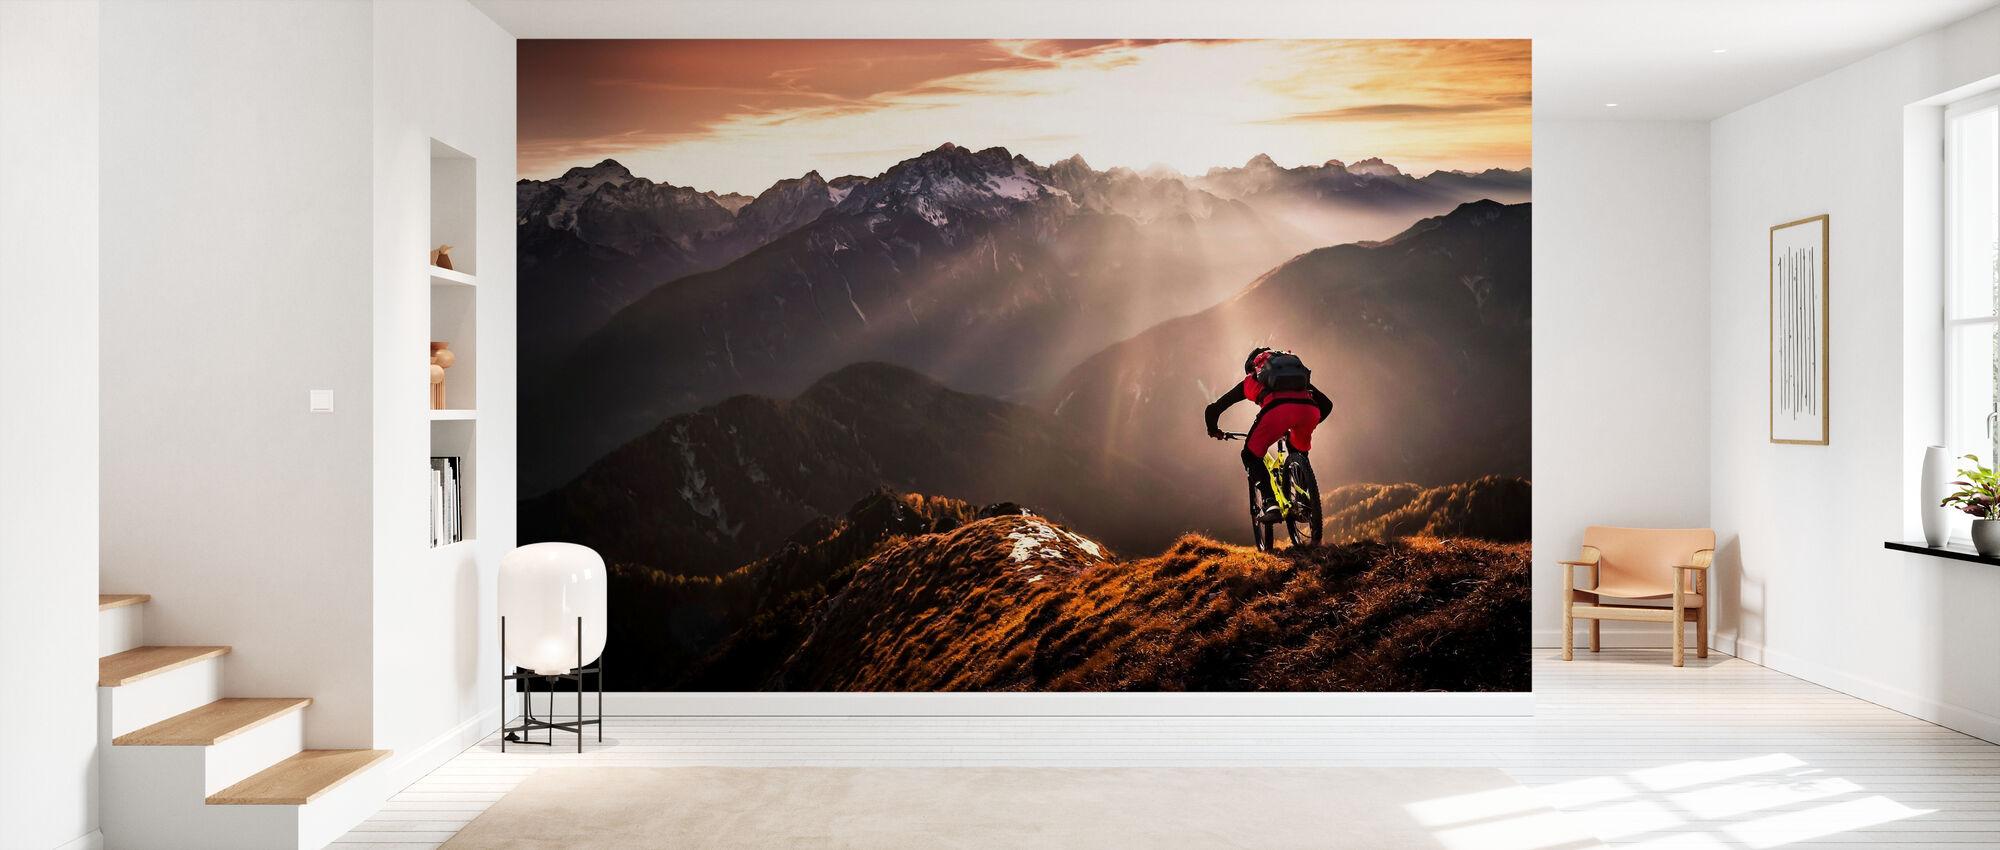 Just Ride - Wallpaper - Hallway